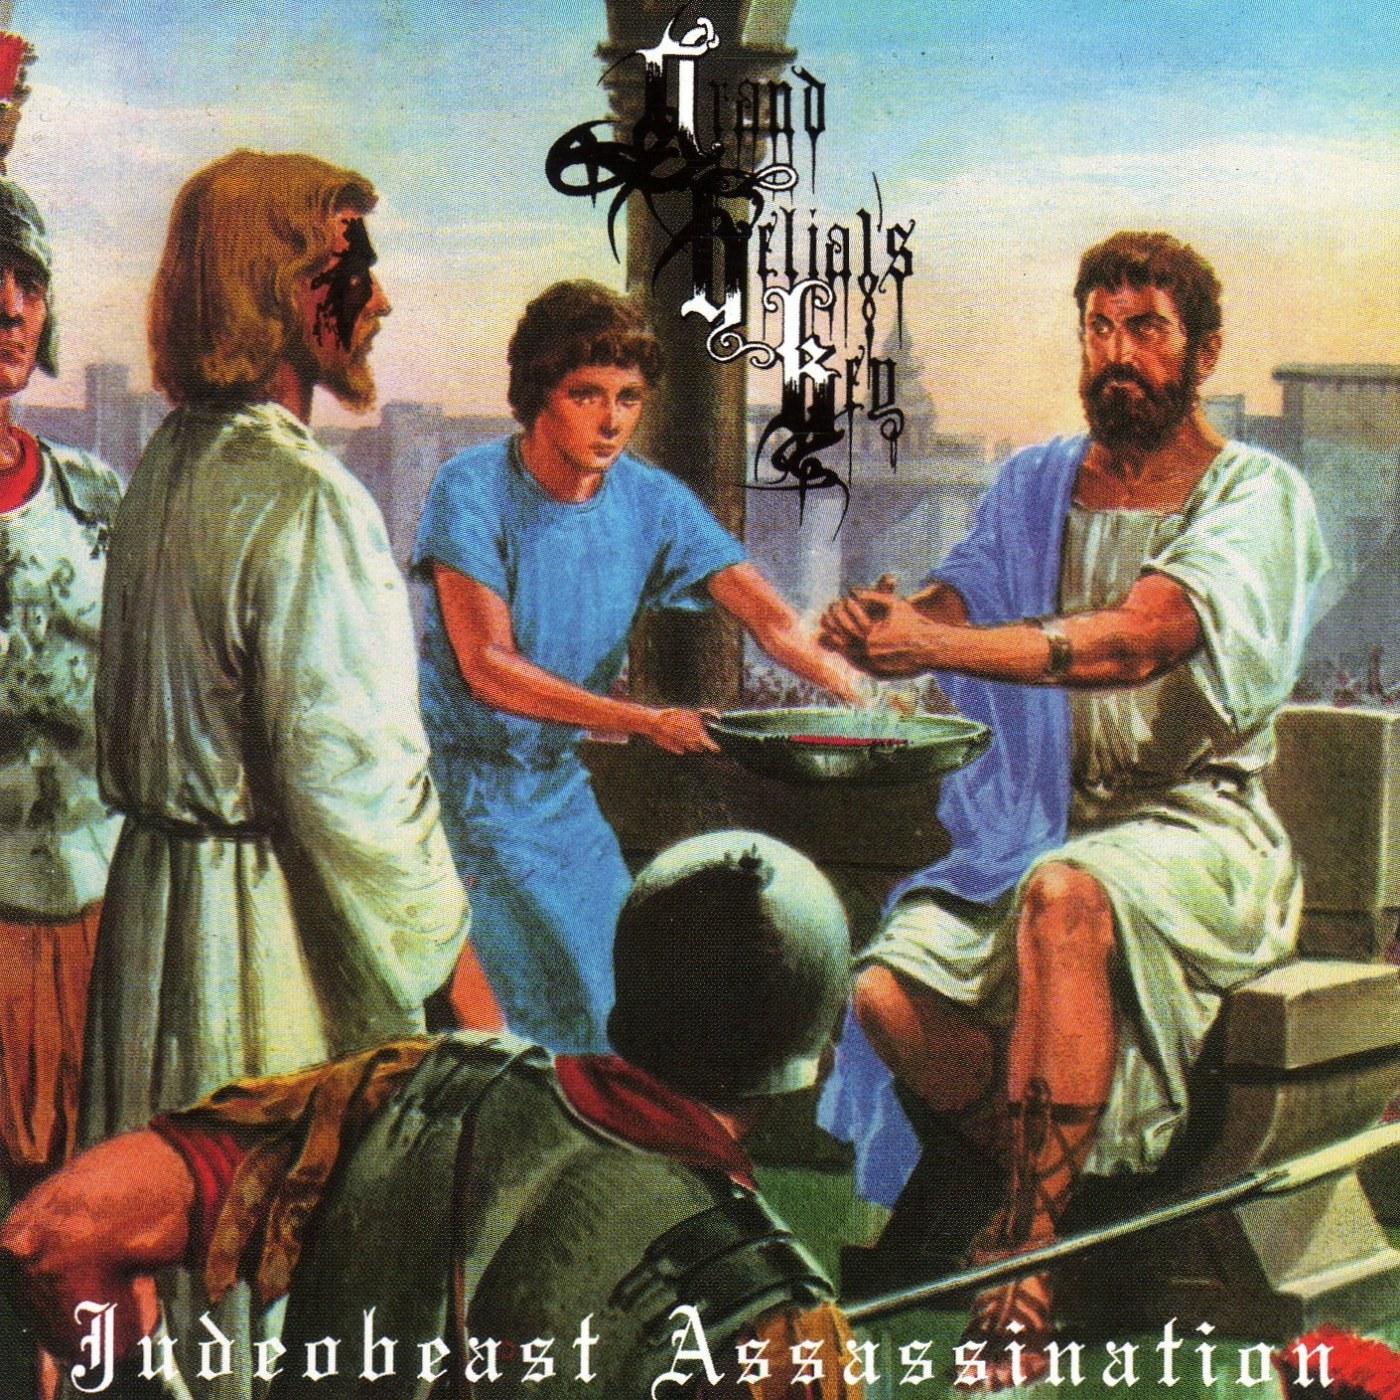 Grand Belial's Key - Judeobeast Assassination